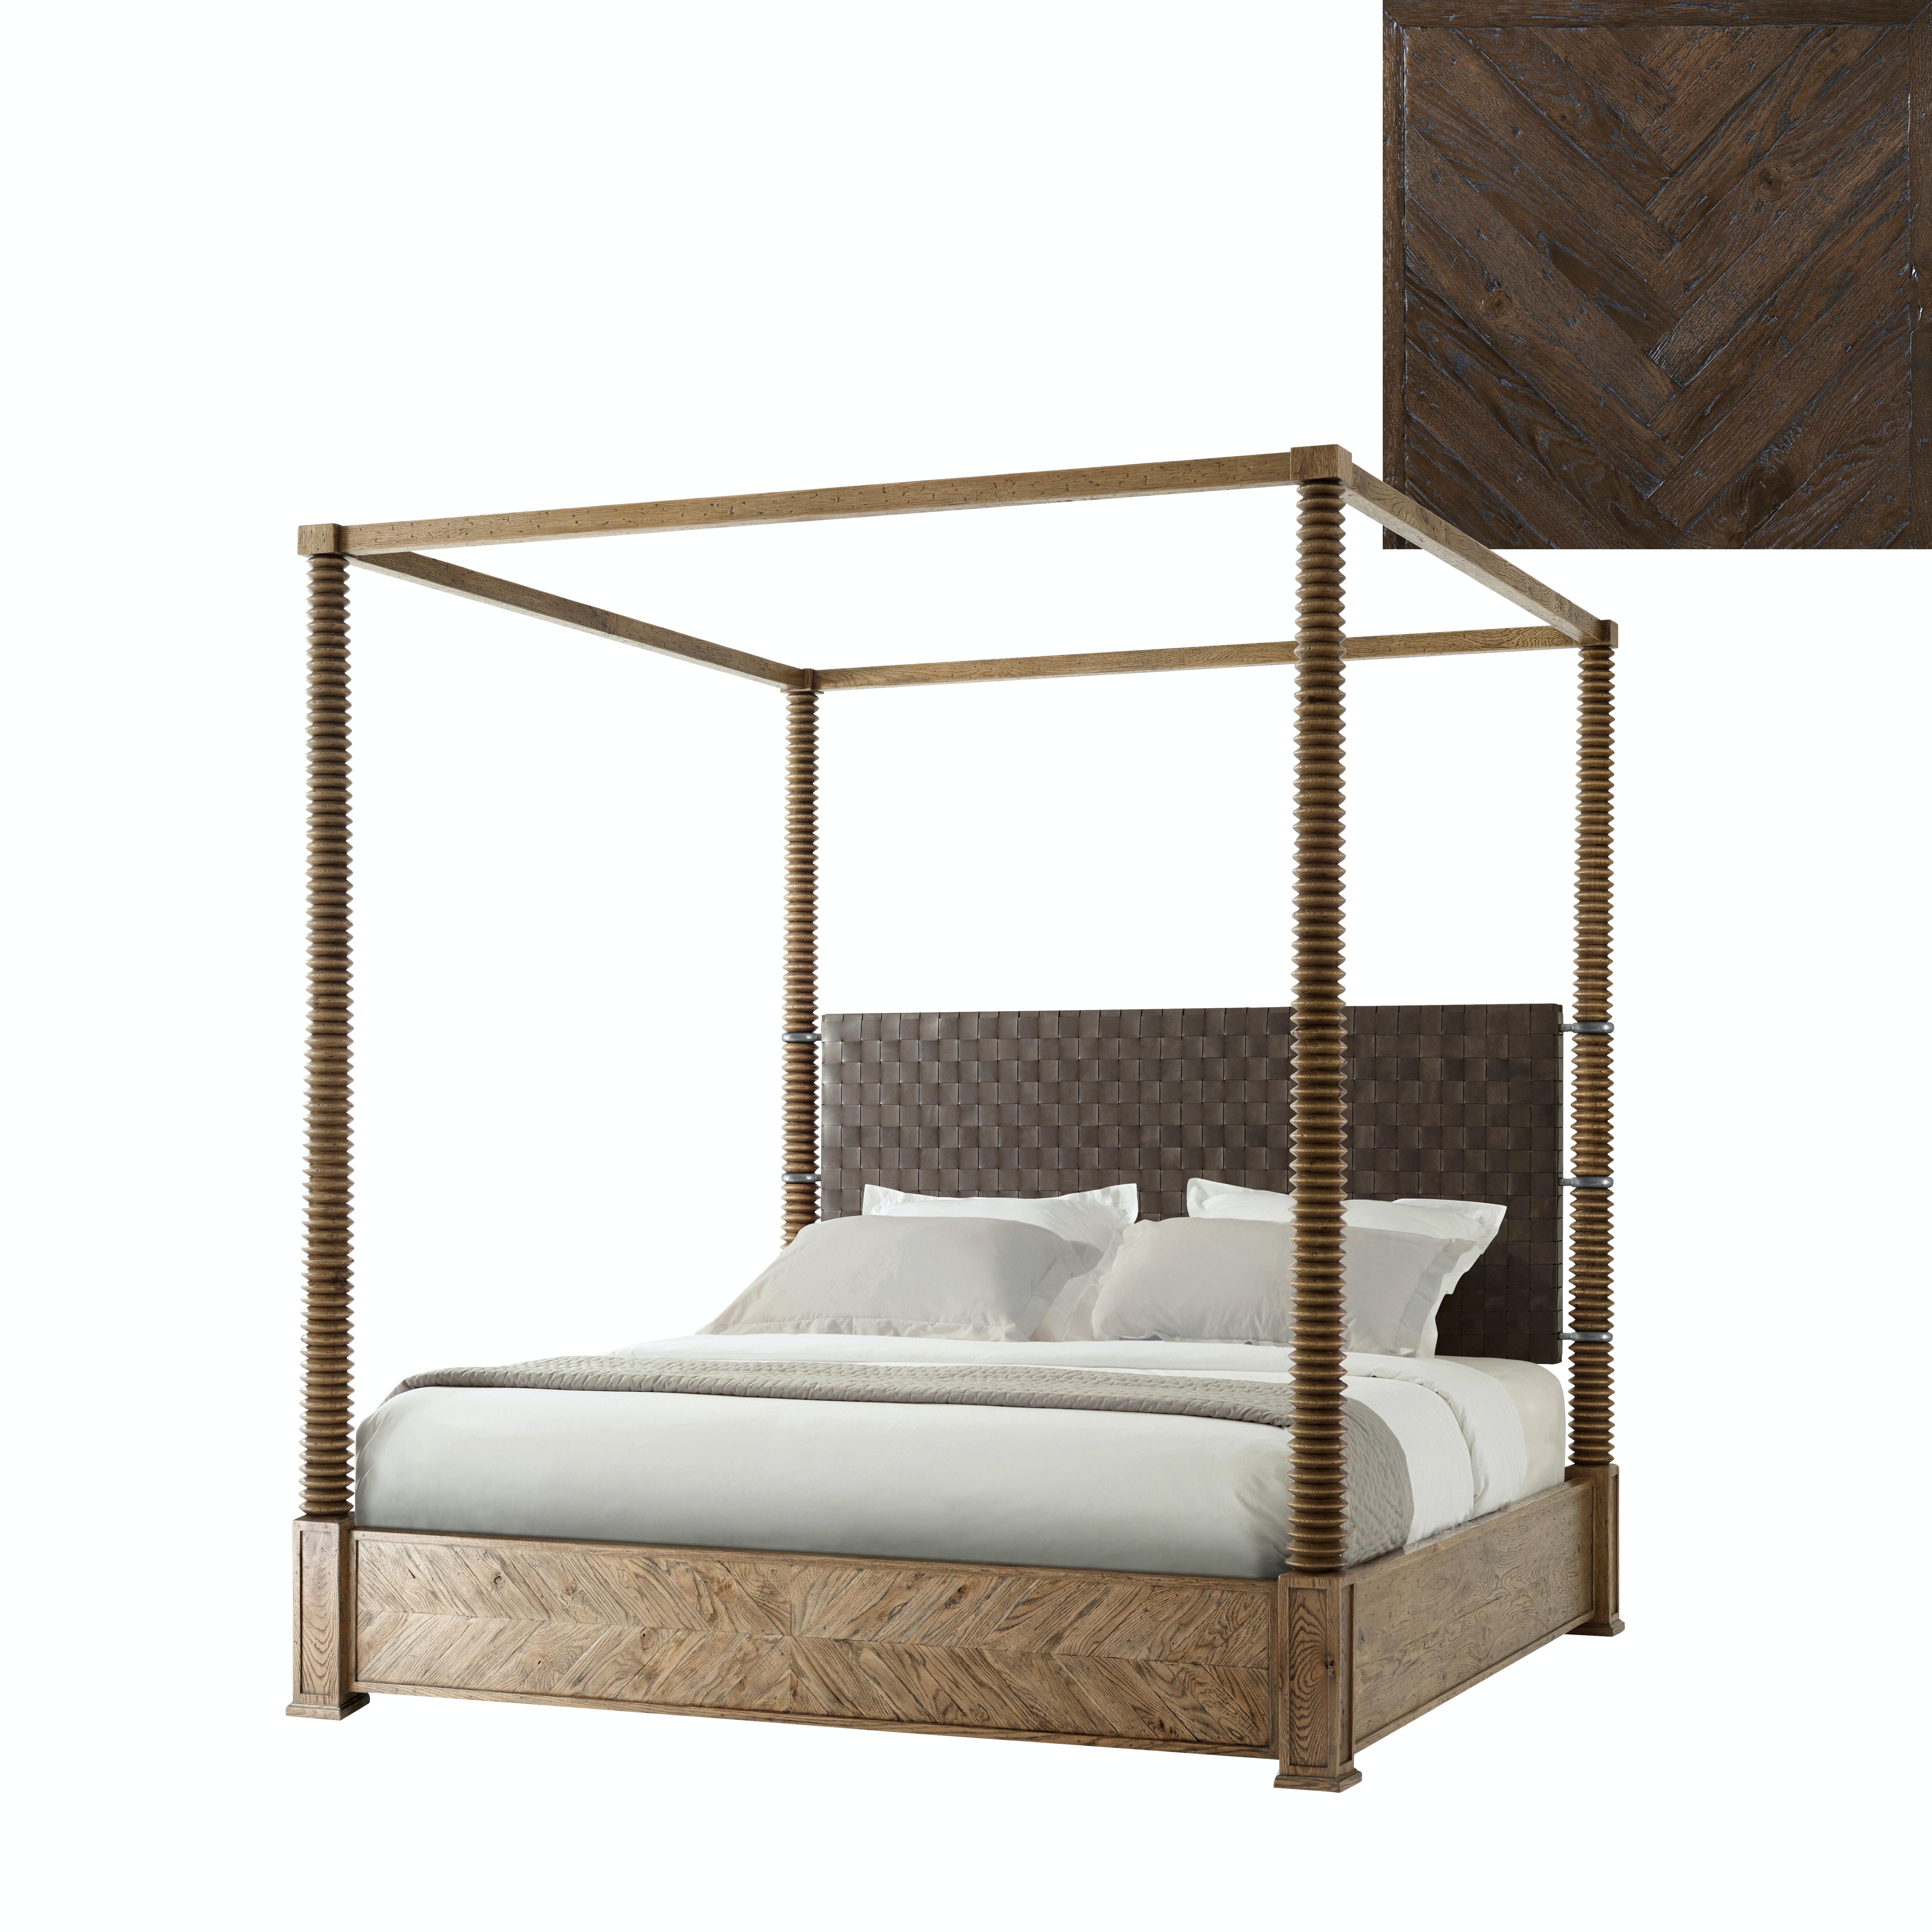 Theodore Alexander Bedroom Weston Bed Us King Cb83004 C075 Oasis